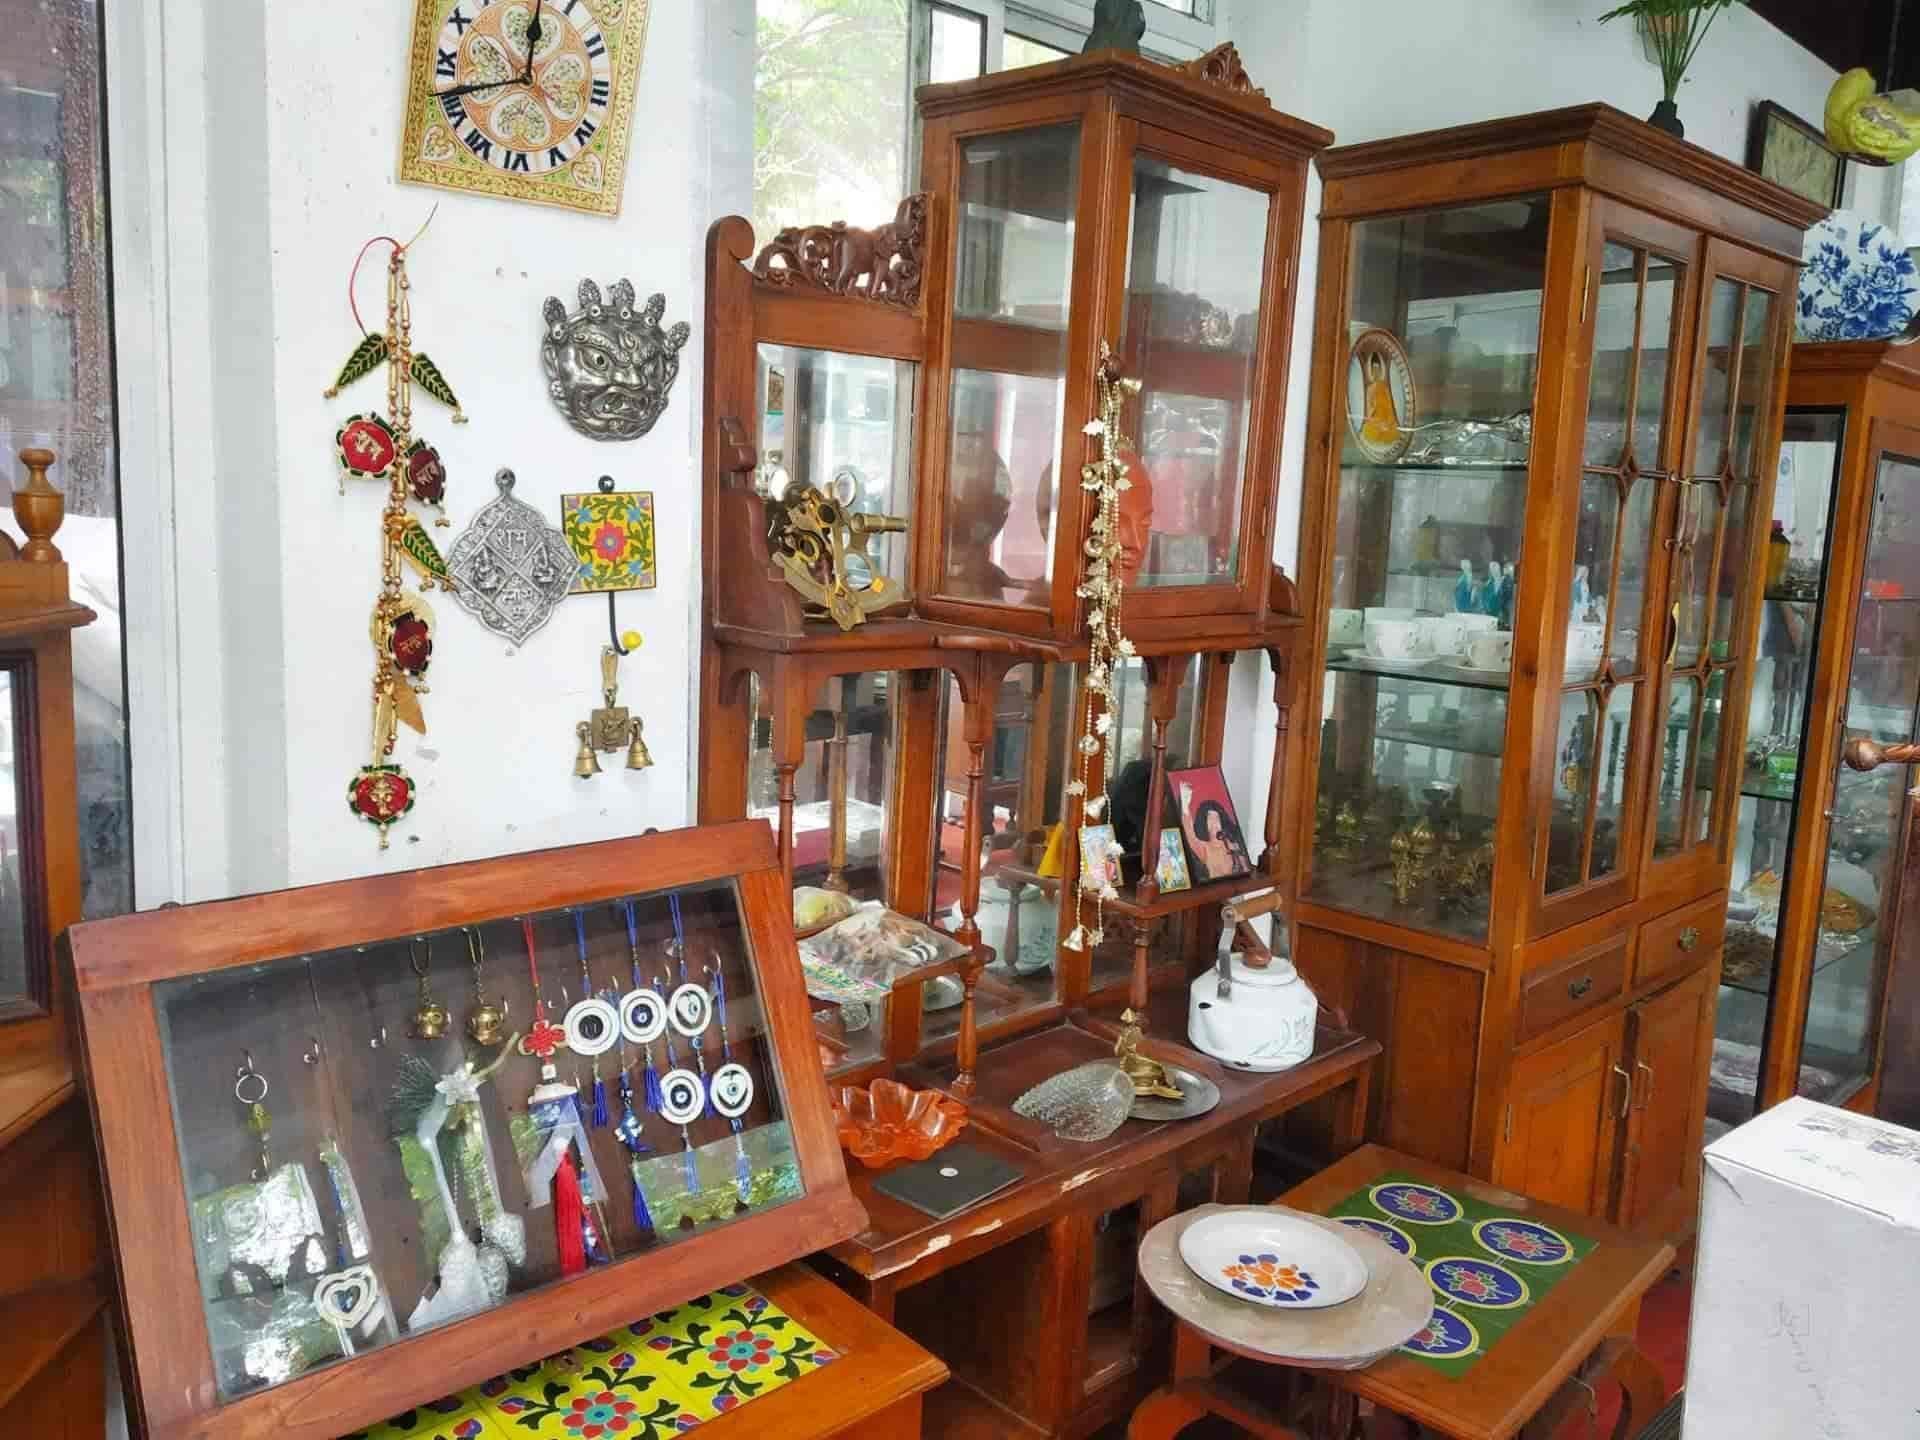 Miraculous Antique Home Decor Statues Poojappura Statue Dealers In Interior Design Ideas Truasarkarijobsexamcom